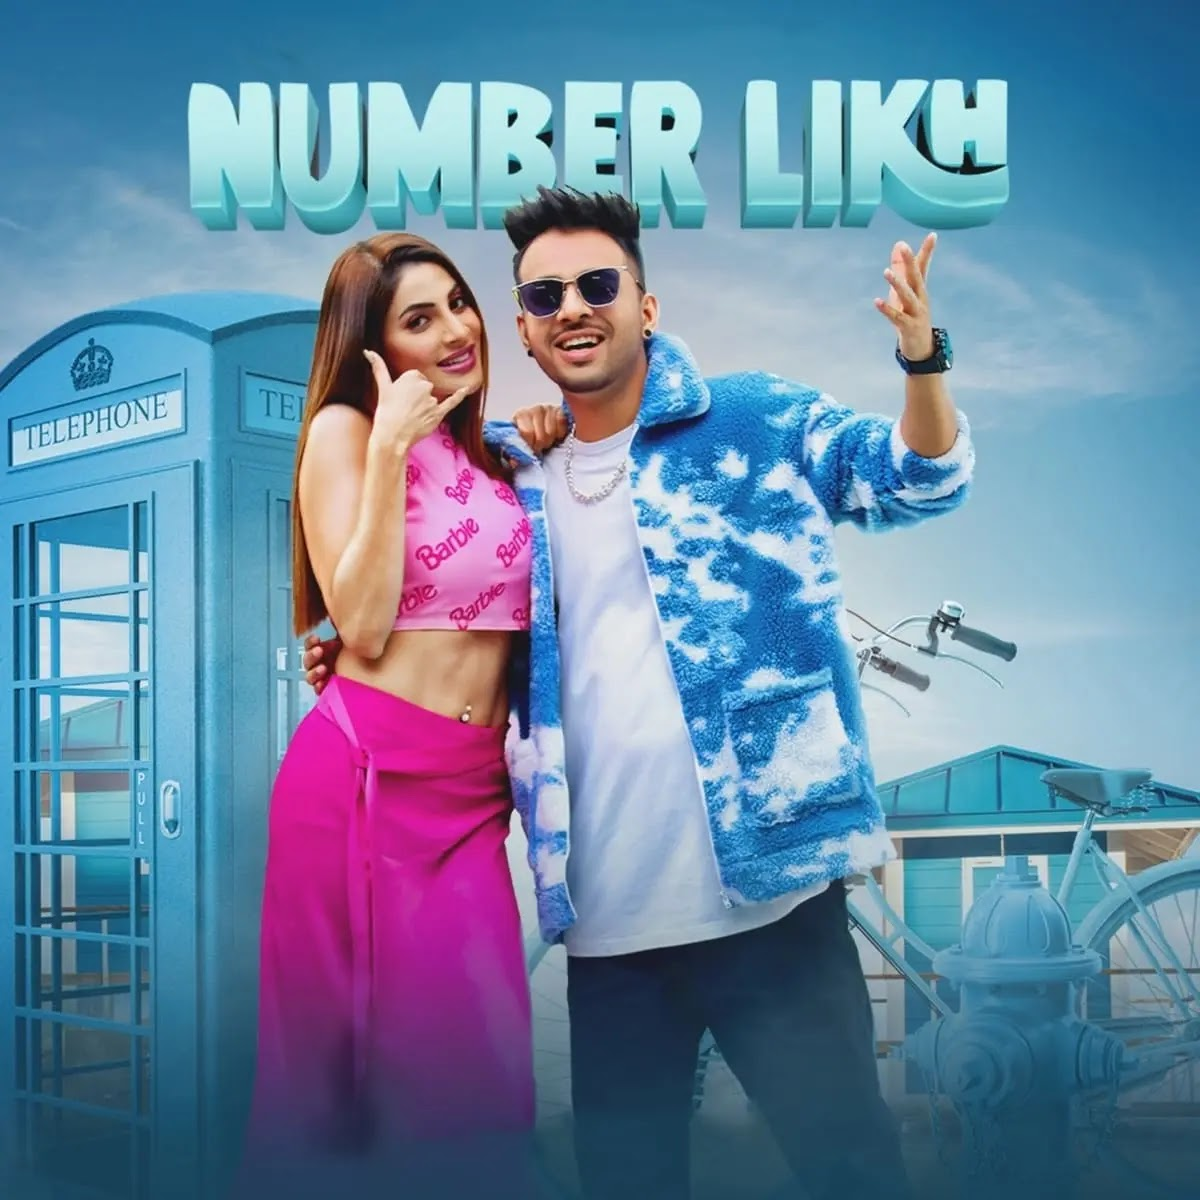 Number Likh Tony Kakkar Mp3 Song Download 320kbps Free